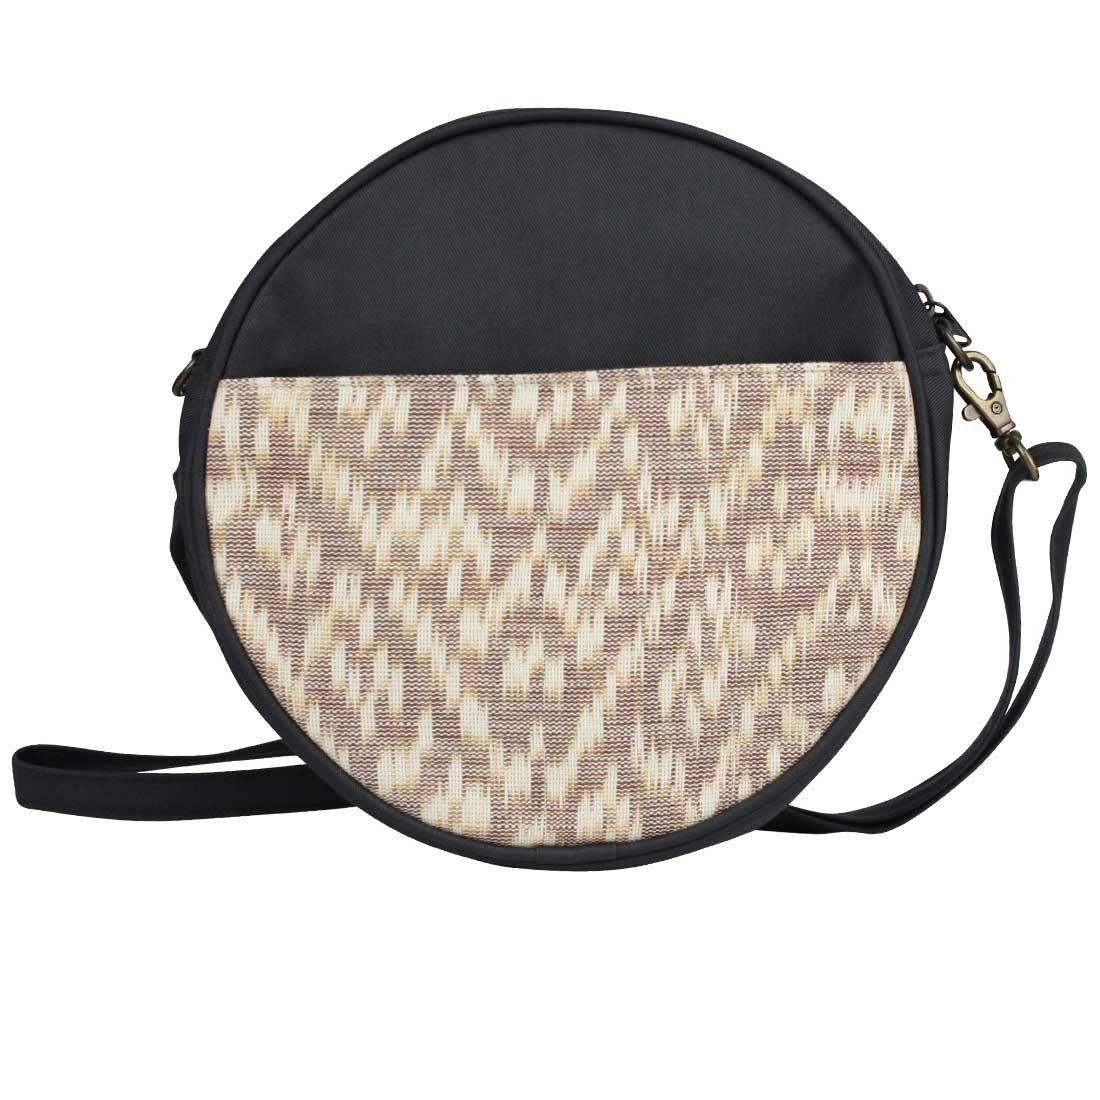 Ethically Made Ikat Round Crossbody Bag